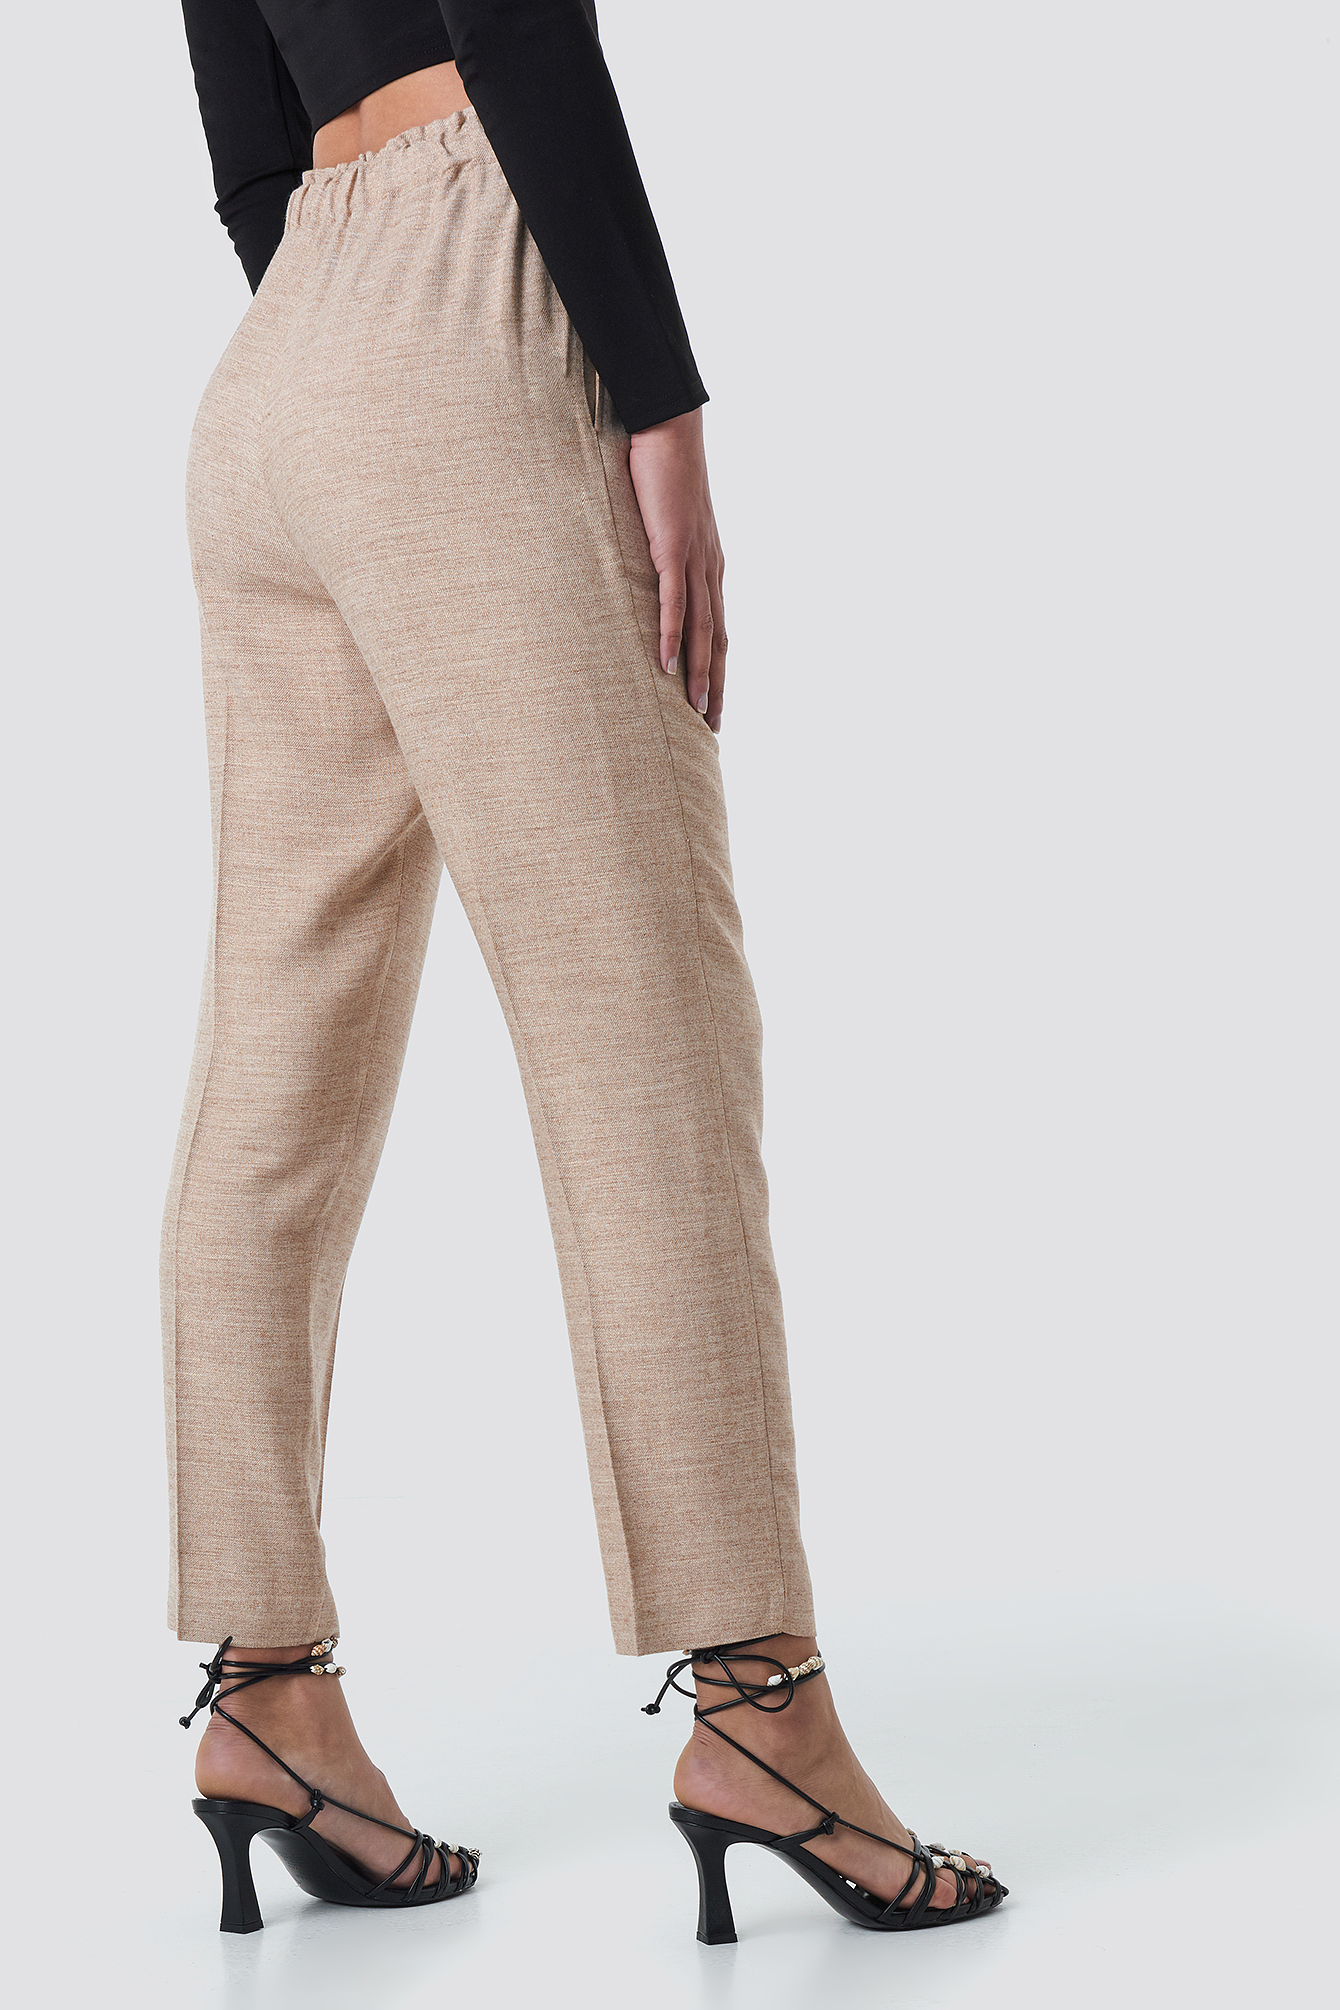 Sabino Trousers NA-KD.COM